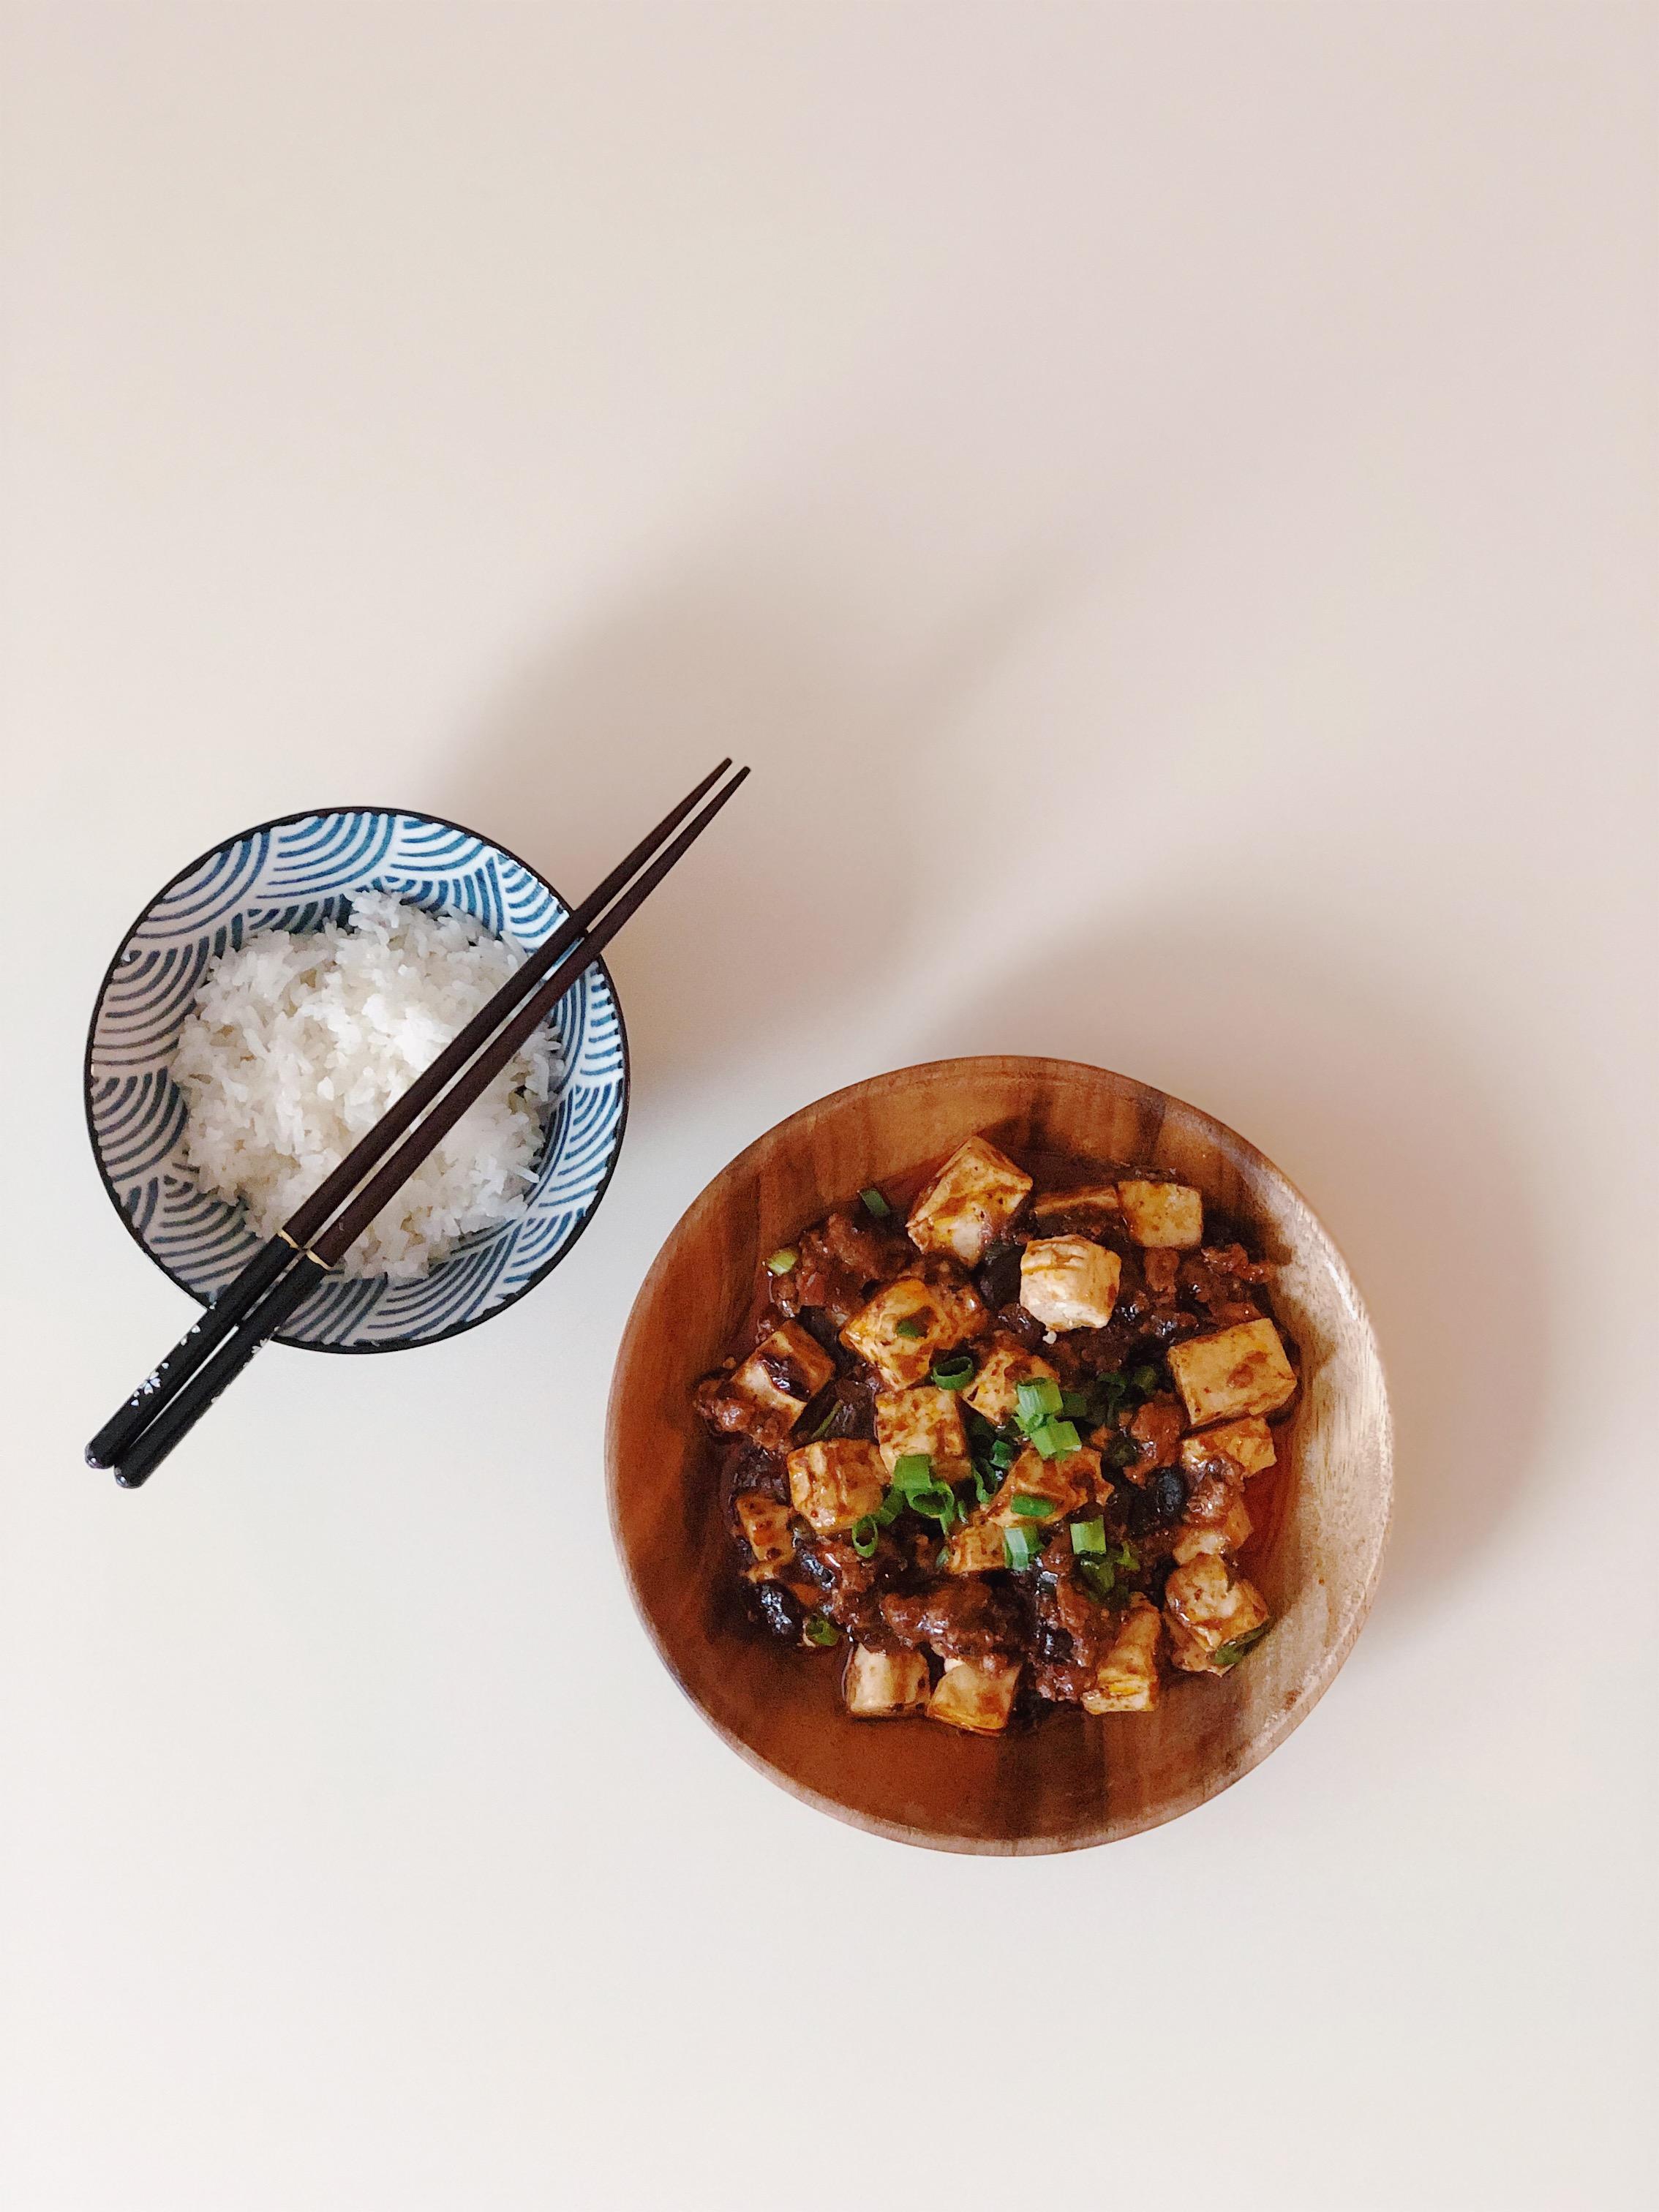 How to make Mapo Tofu (麻婆豆腐) - my mom's recipe!